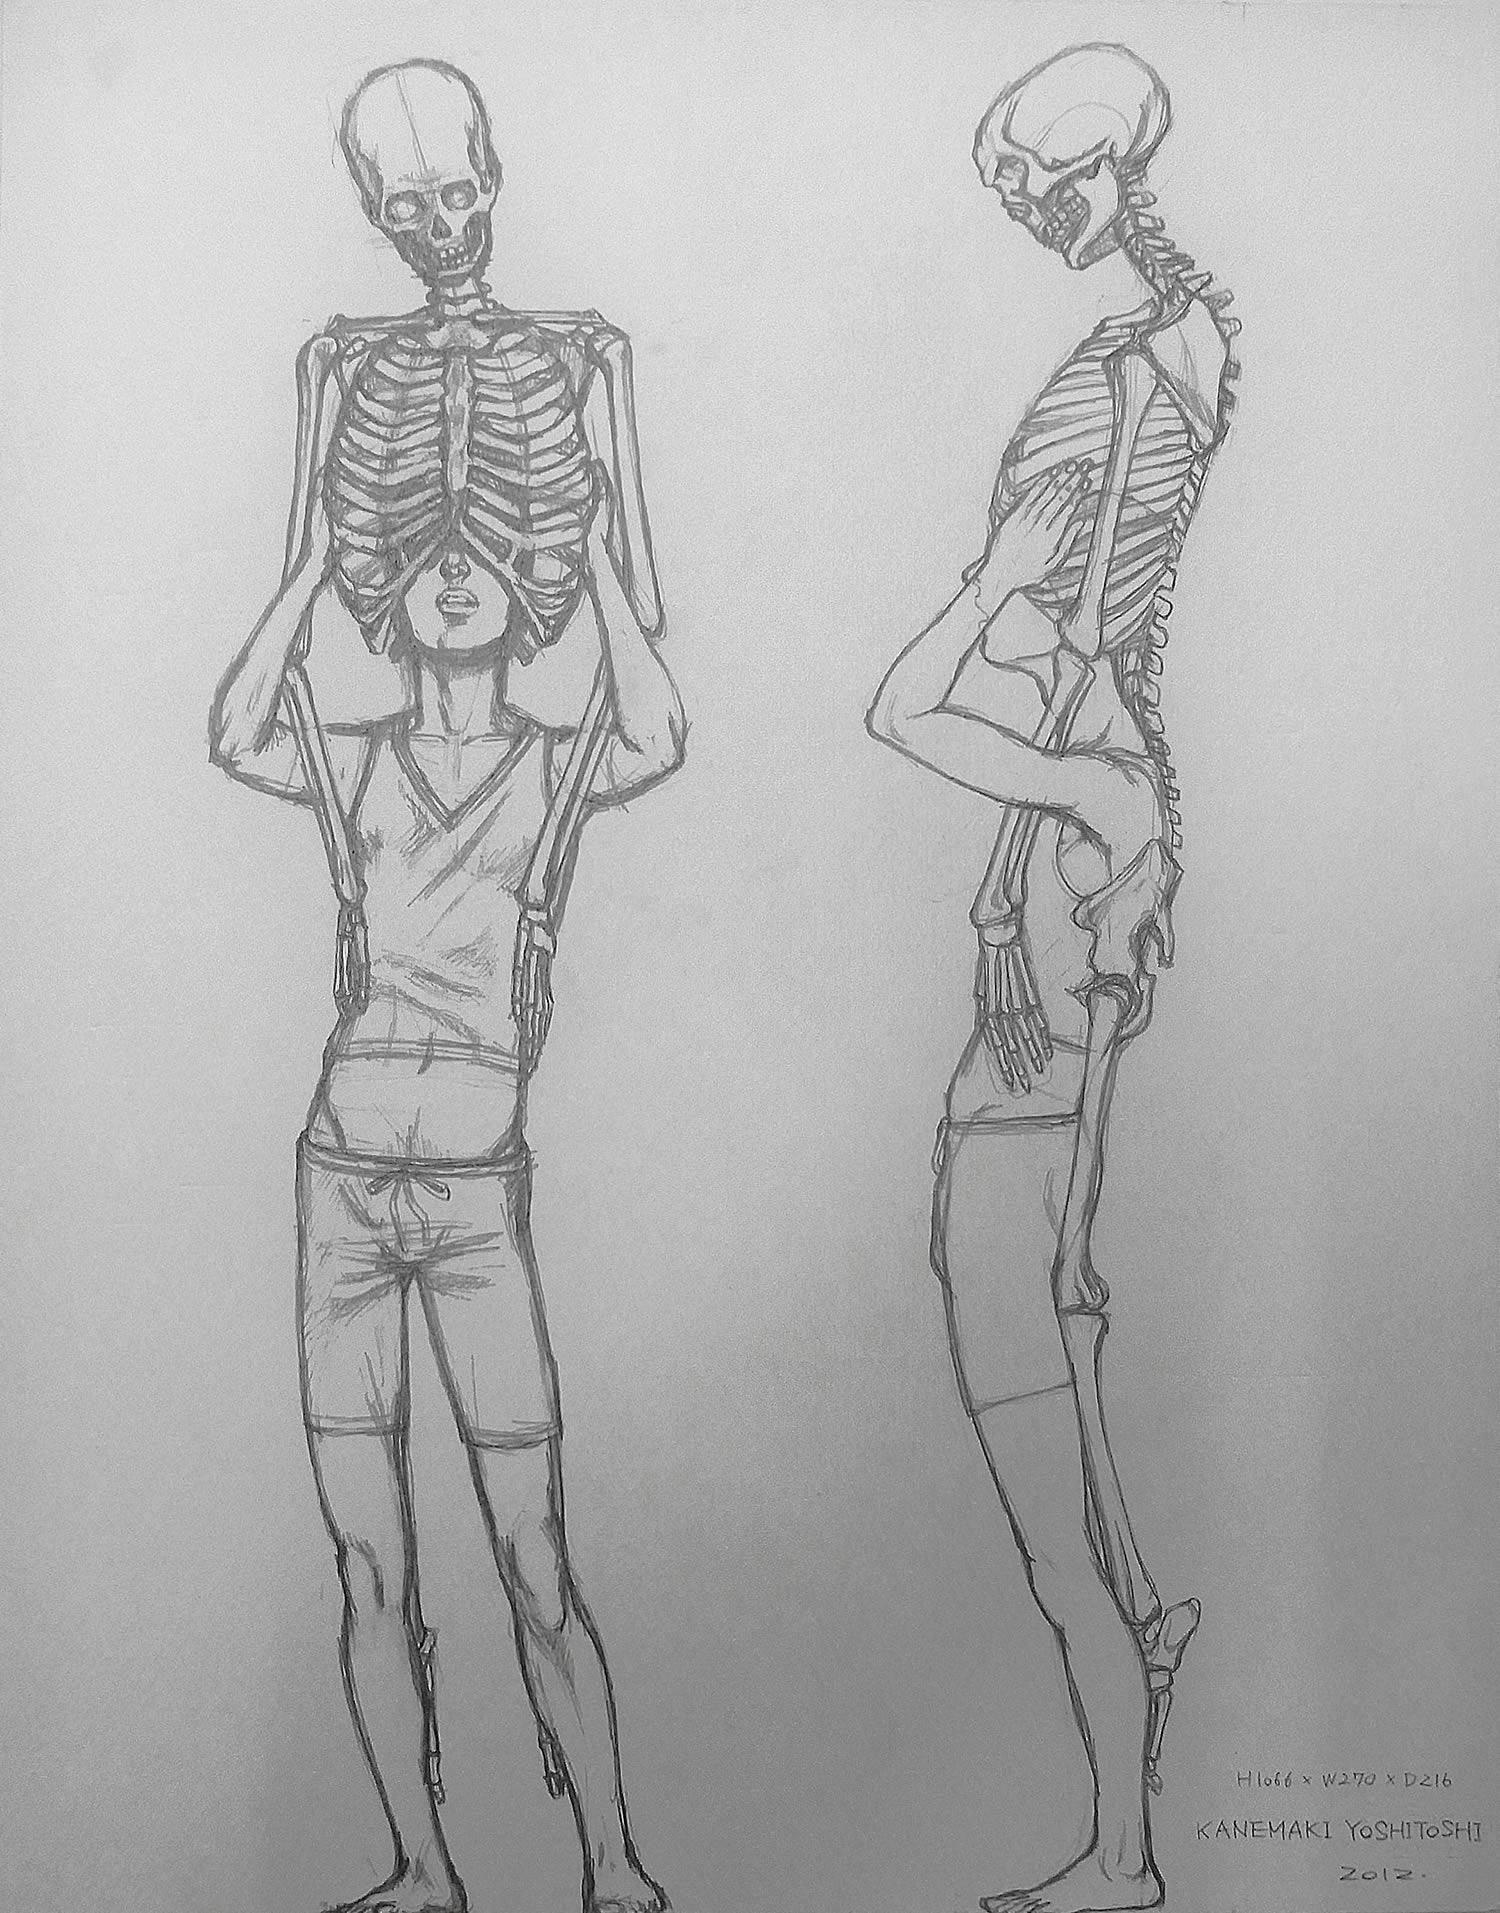 skeleton and boy sketch on paper